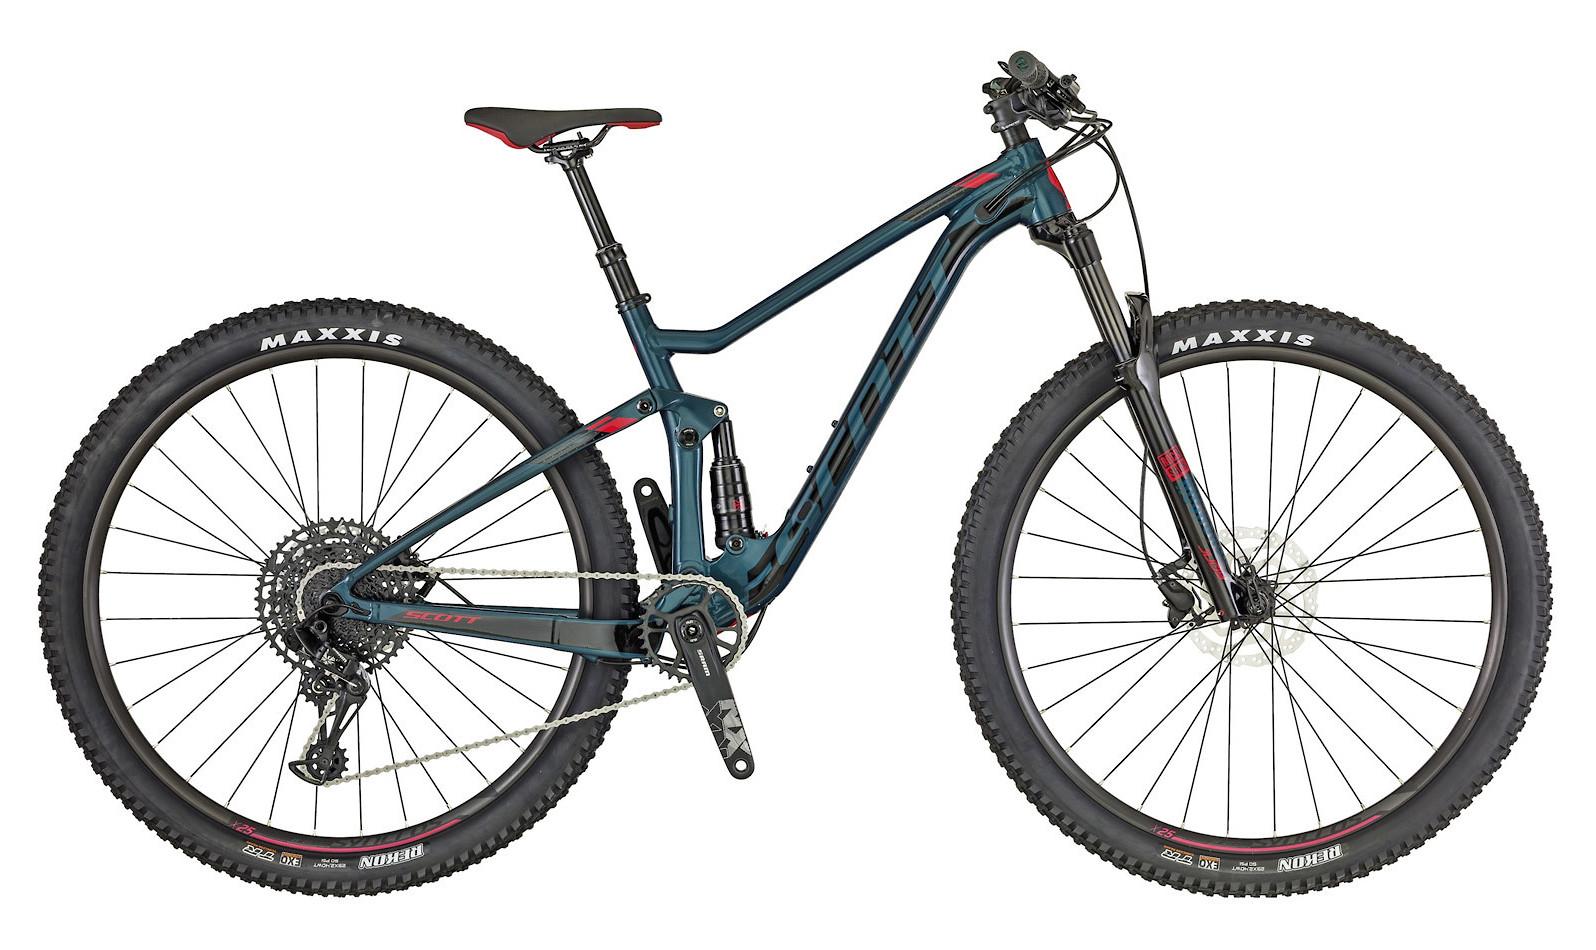 2019 Scott Spark 930 Contessa Bike